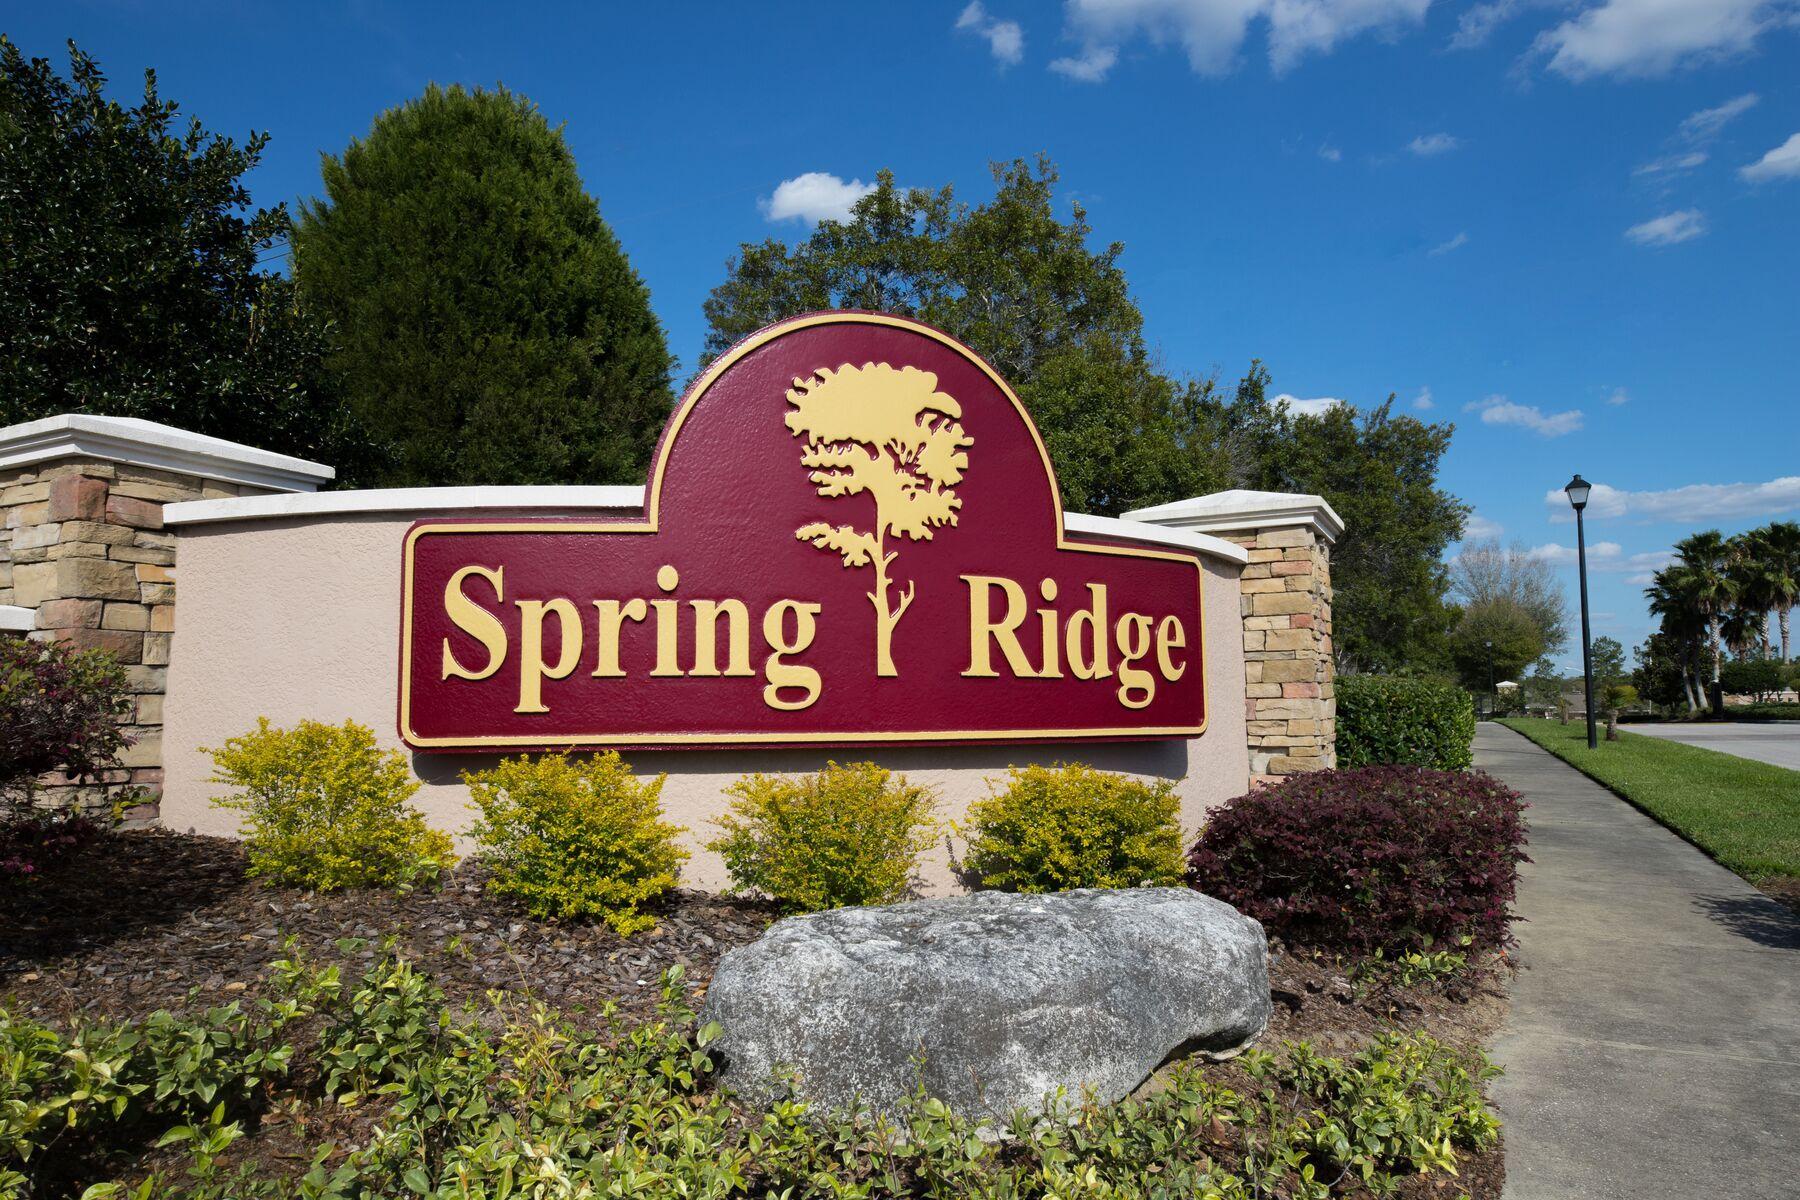 LGI Homes at Spring Ridge